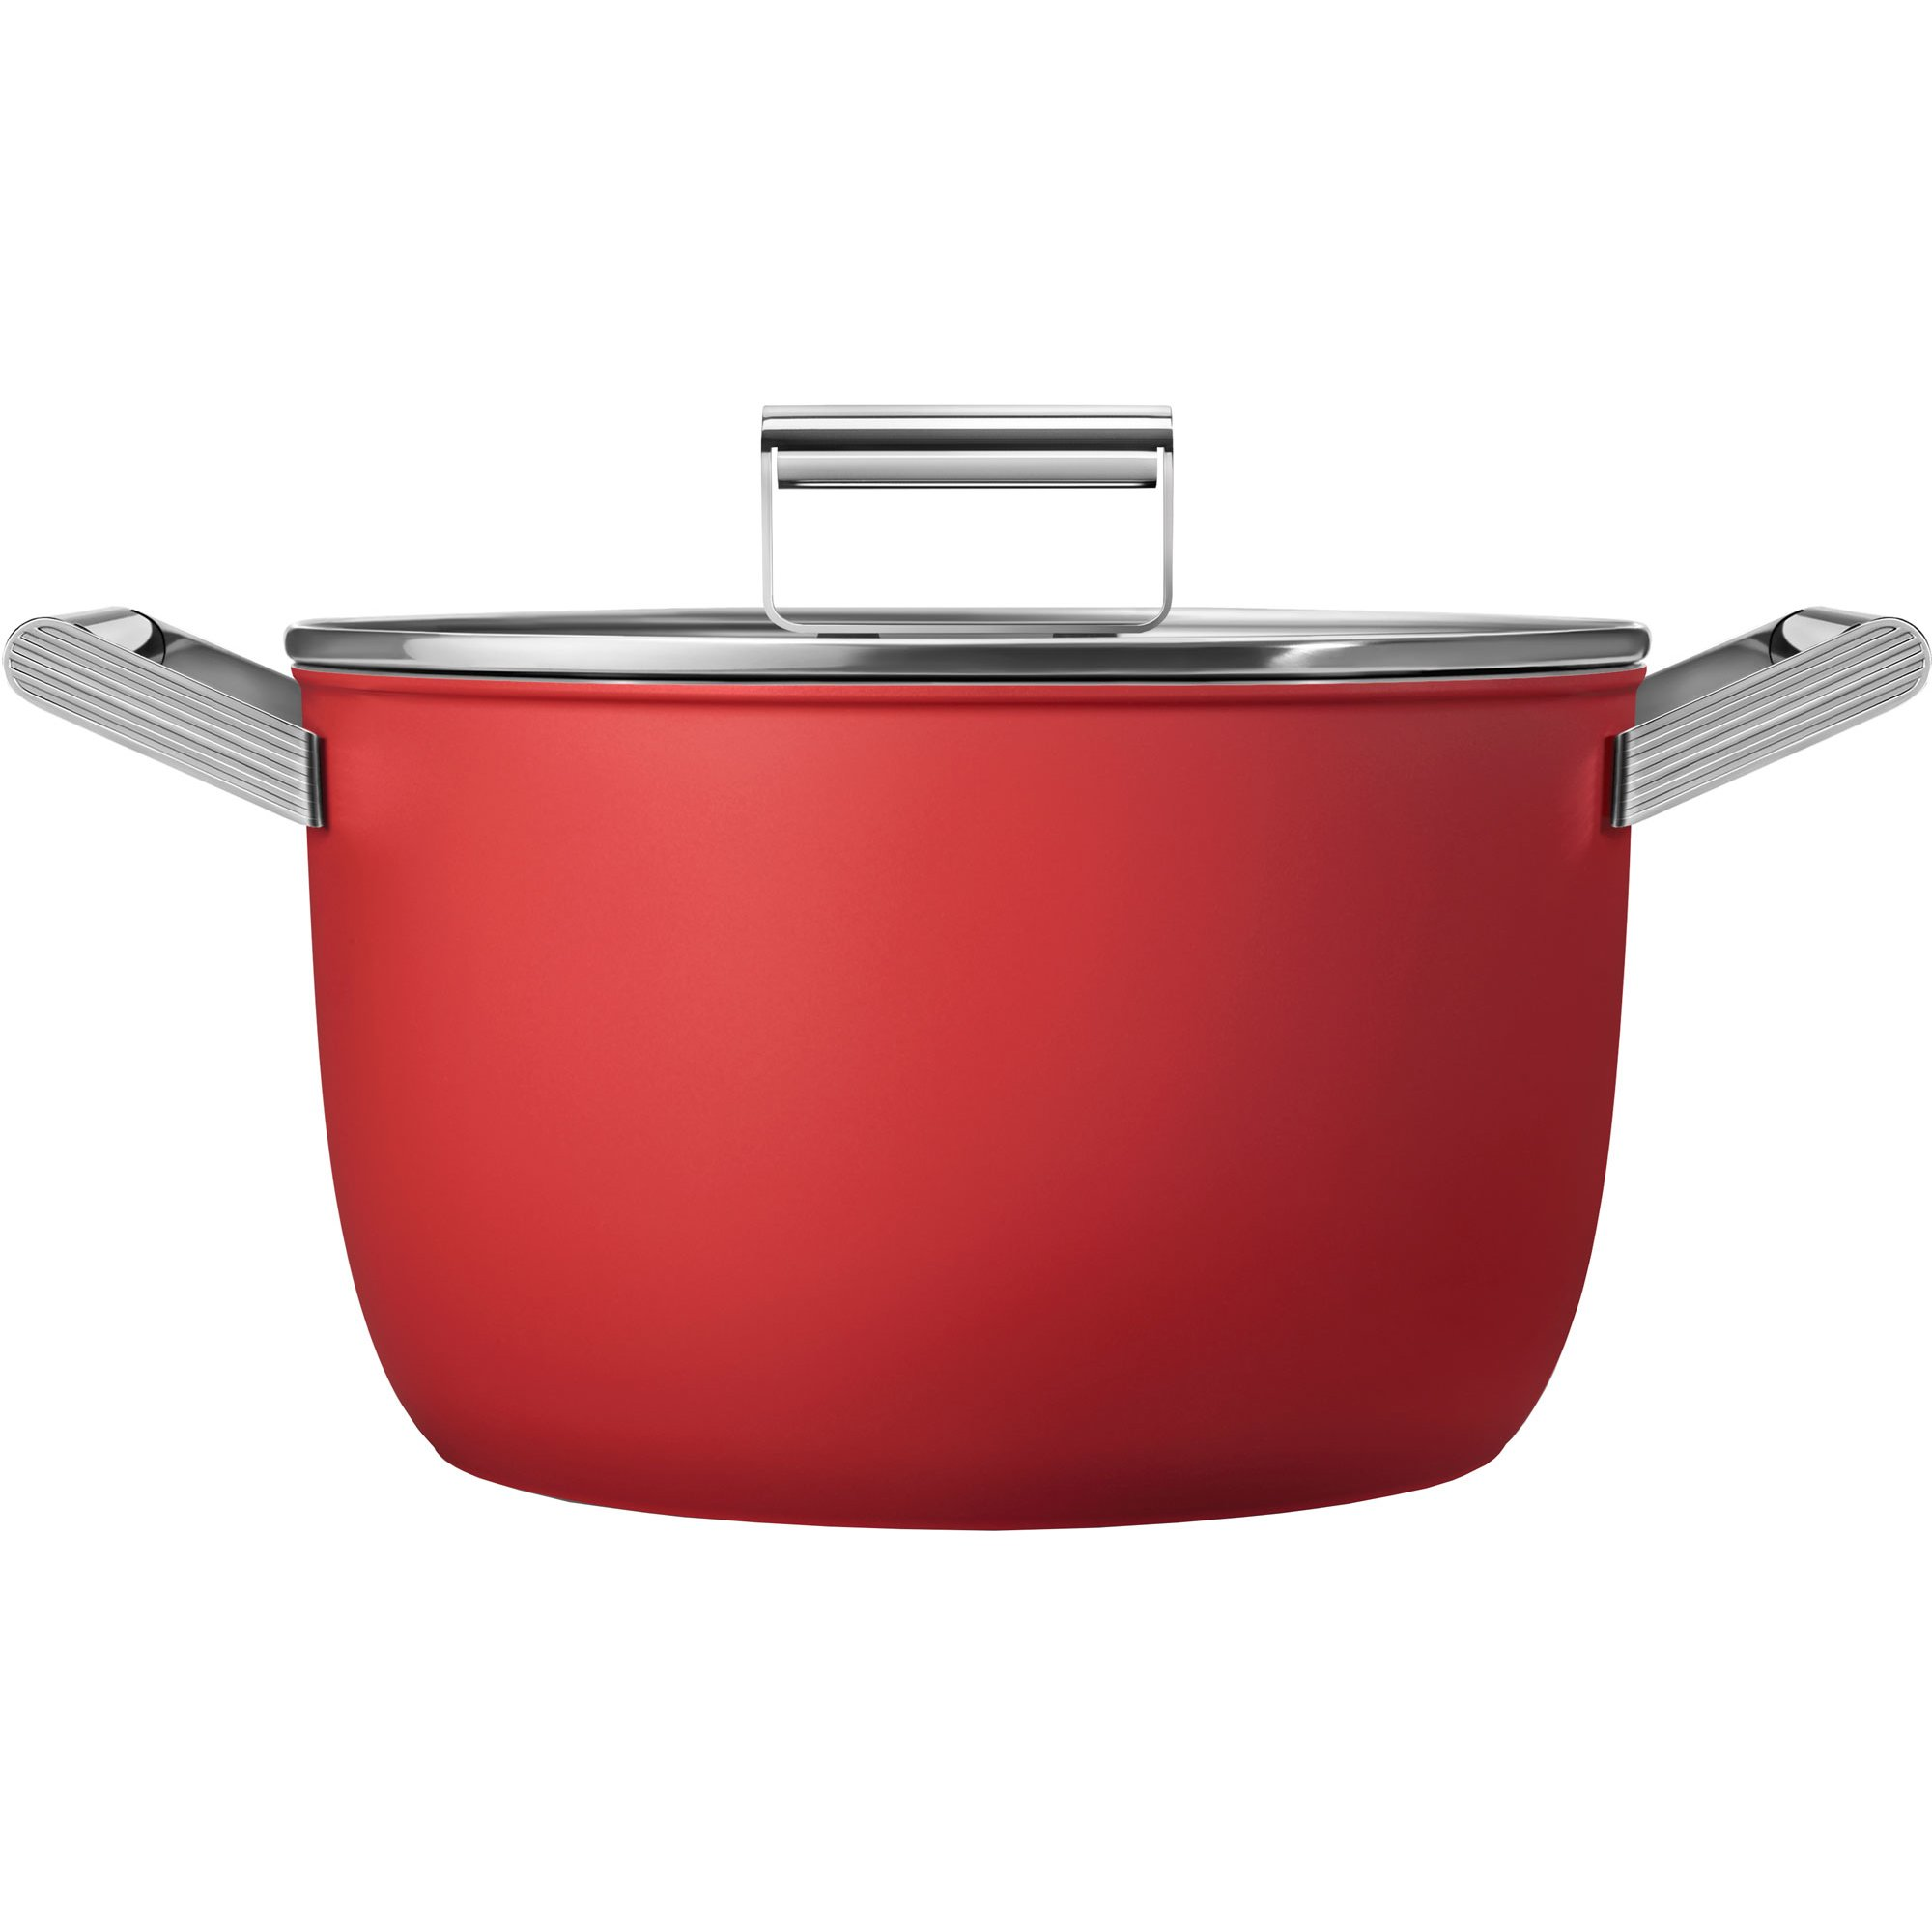 Smeg Kastrull m/lock 26 cm röd